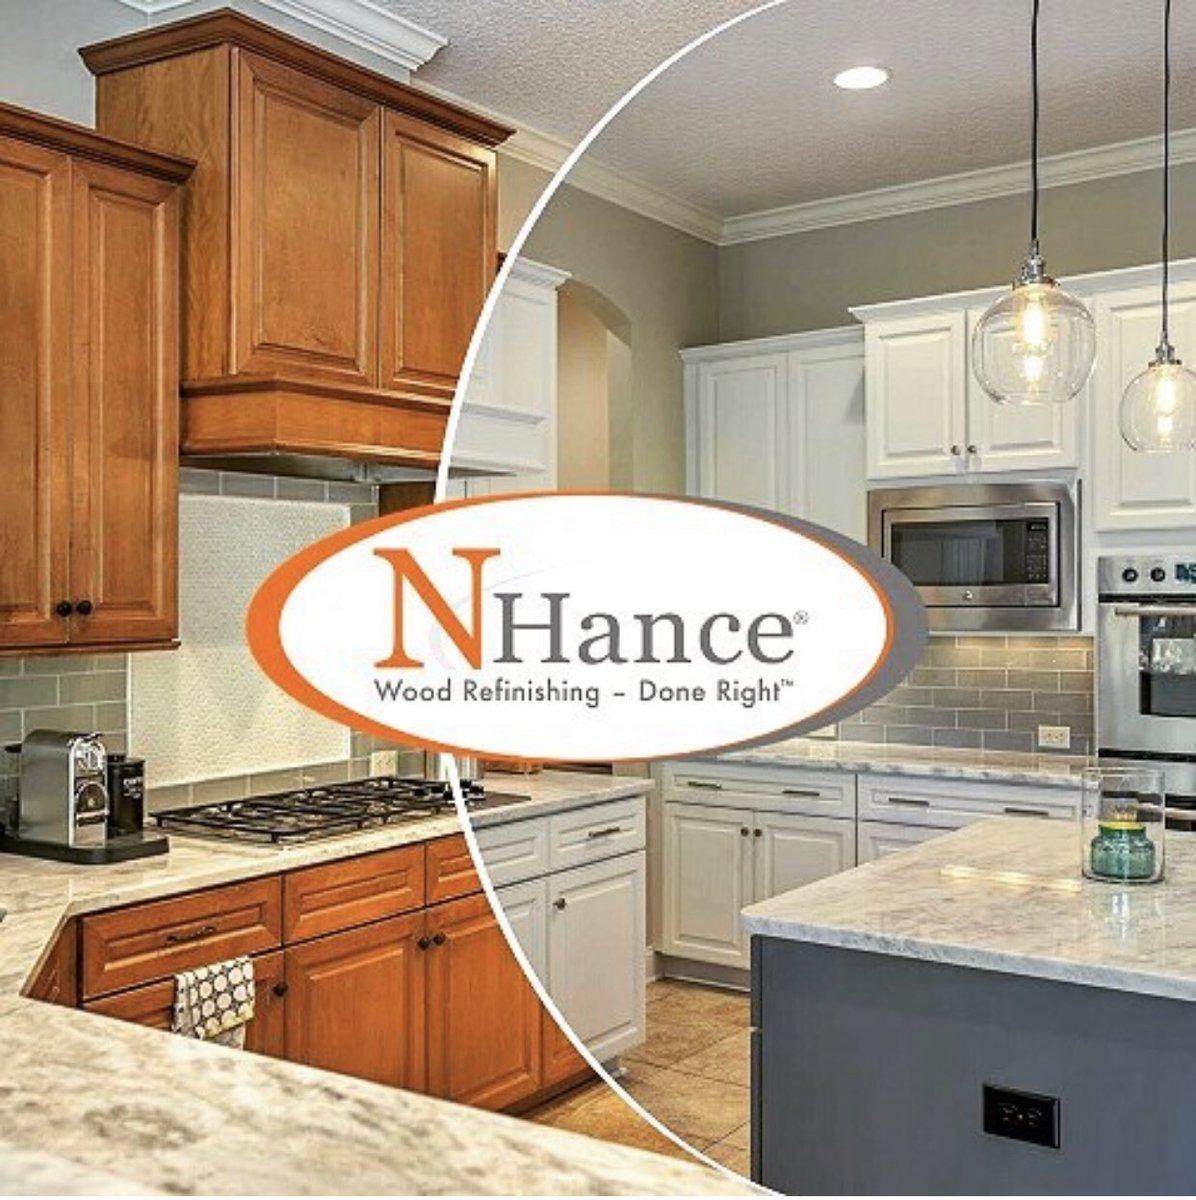 Nhance Hamilton Nhanceh Twitter